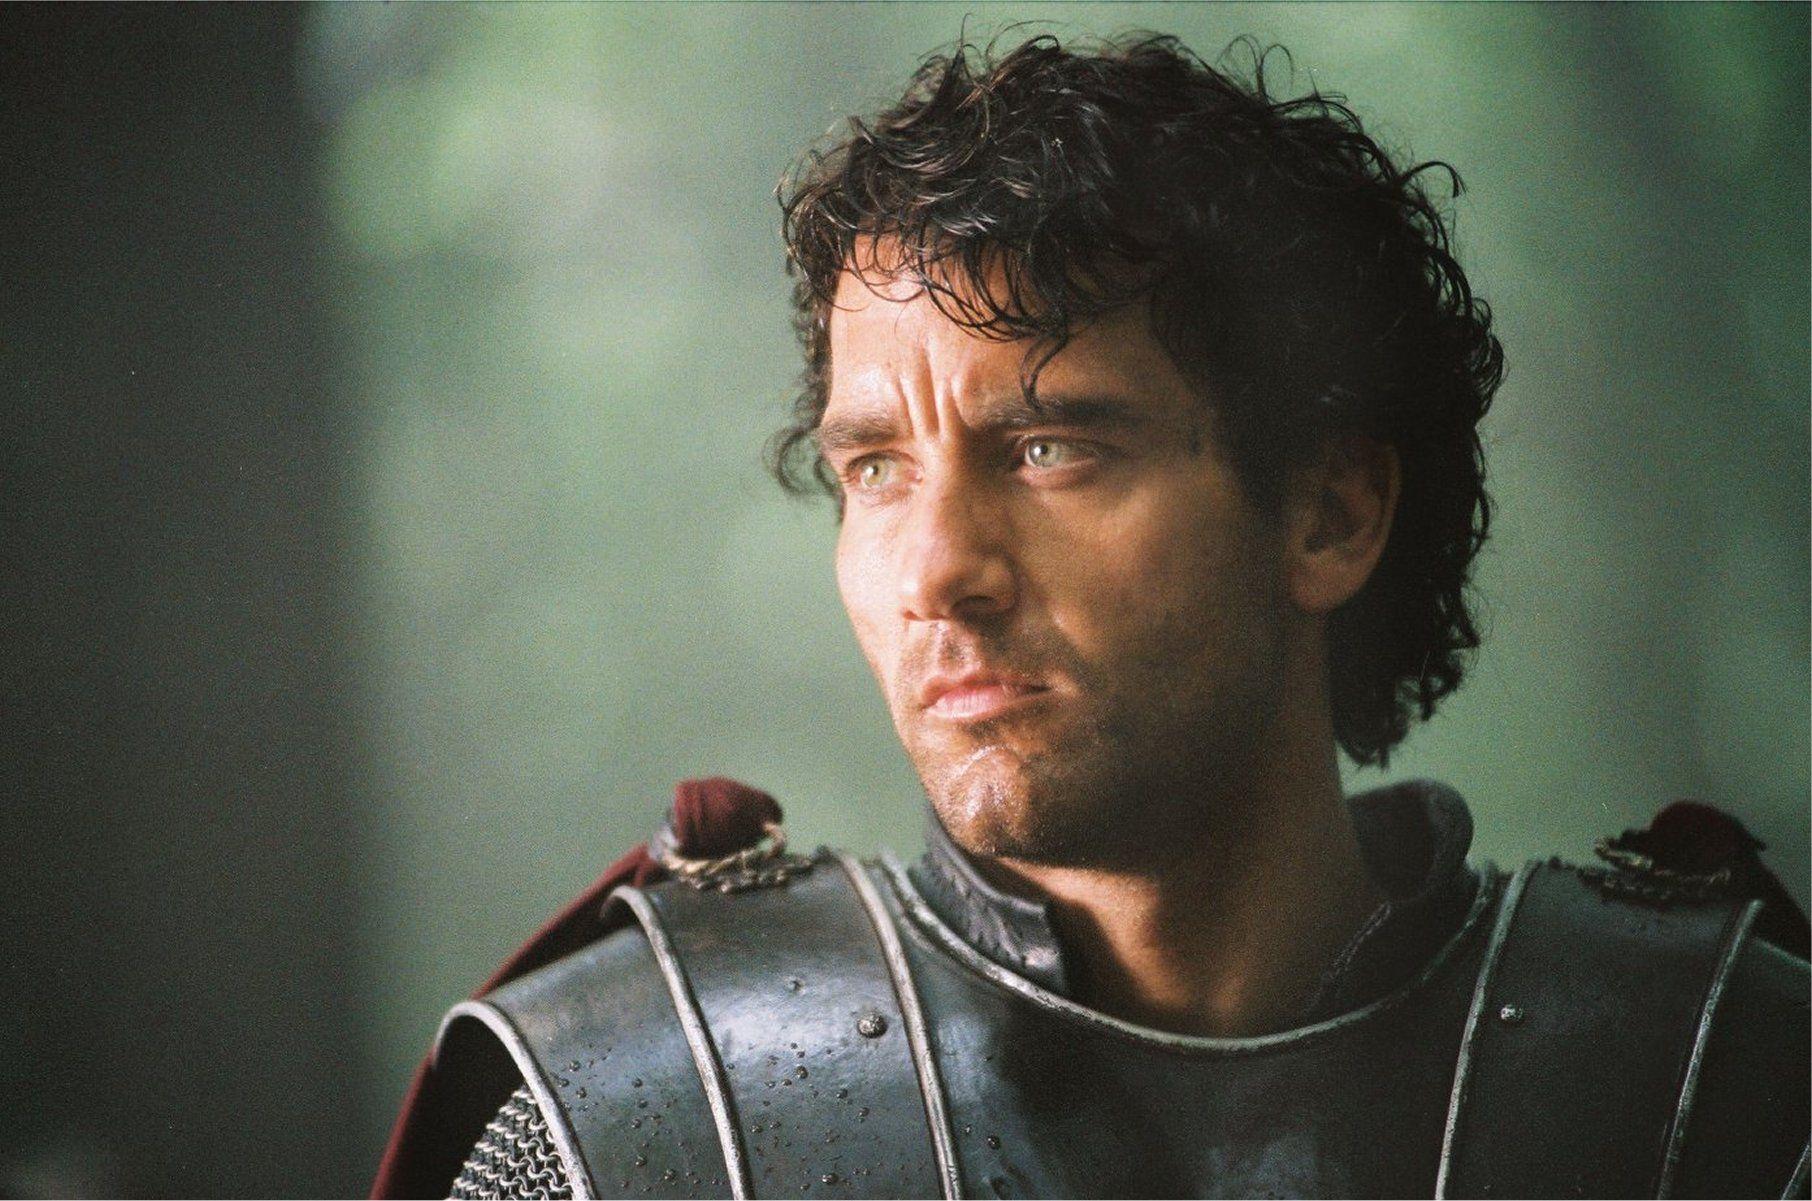 Clive Owen as King Arthur (2004)